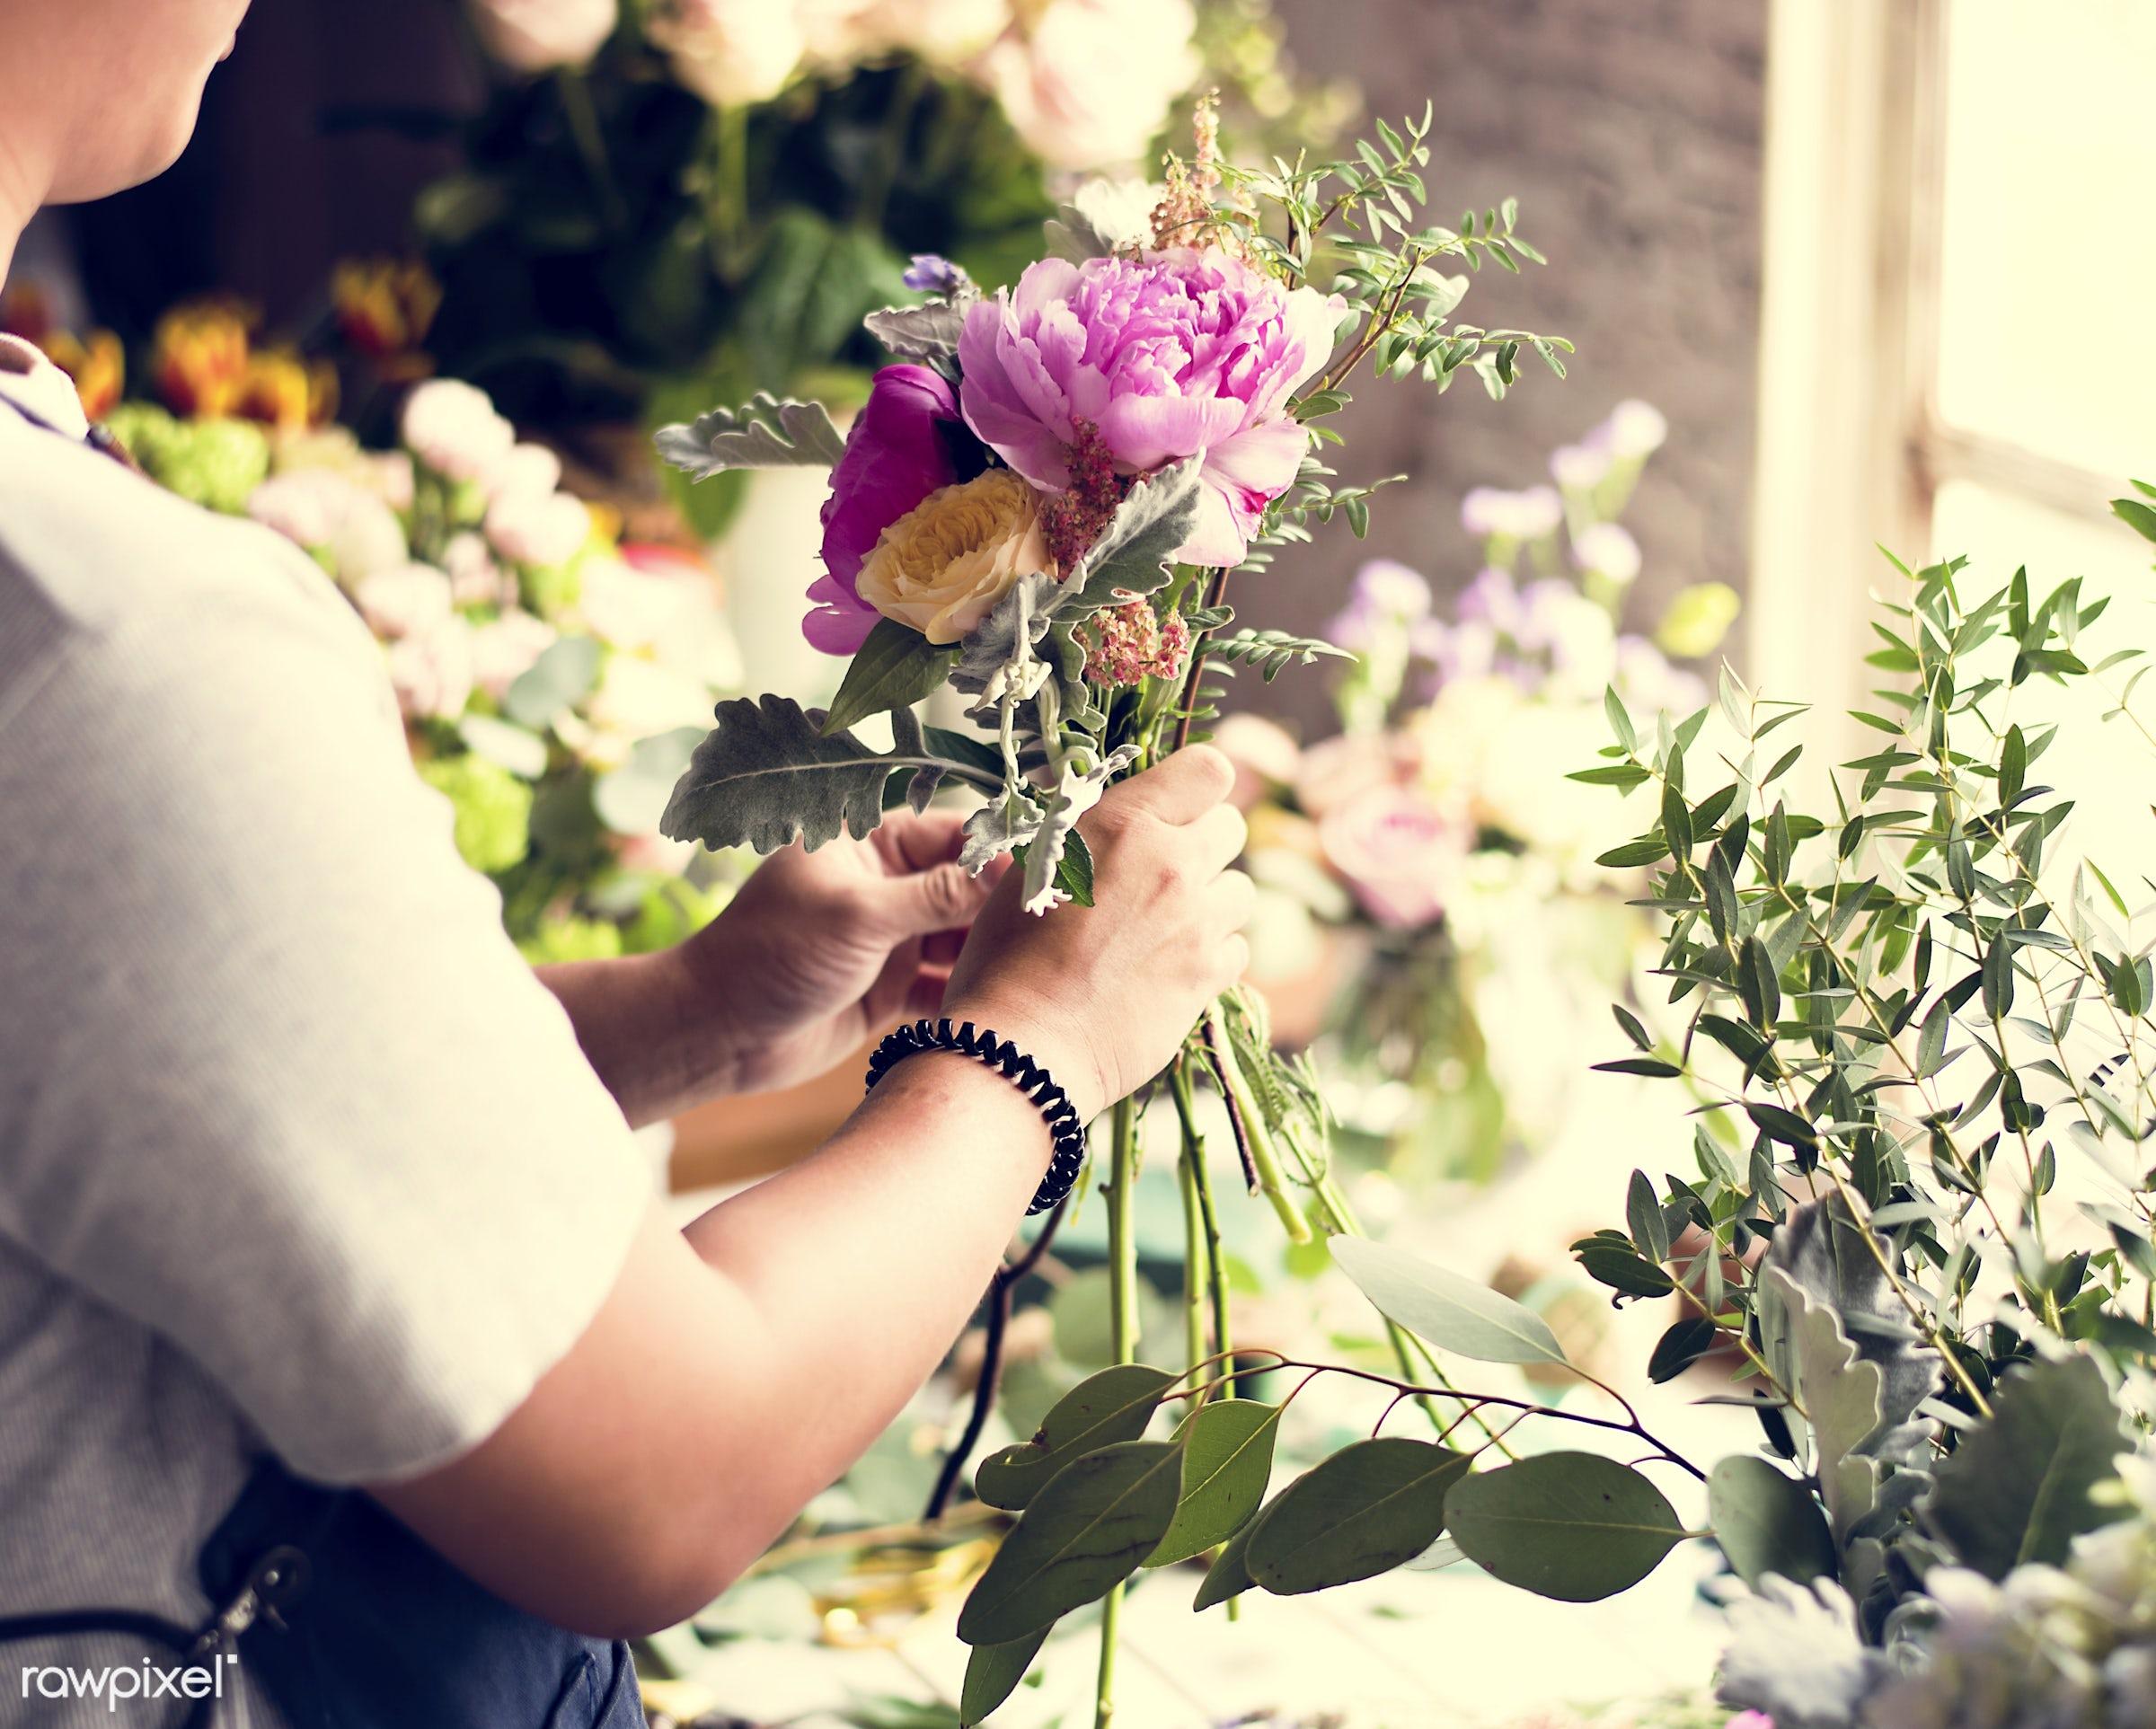 bouquet, shop, detail, person, people, decor, nature, flowers, work, refreshment, hold, career, florist, present,...